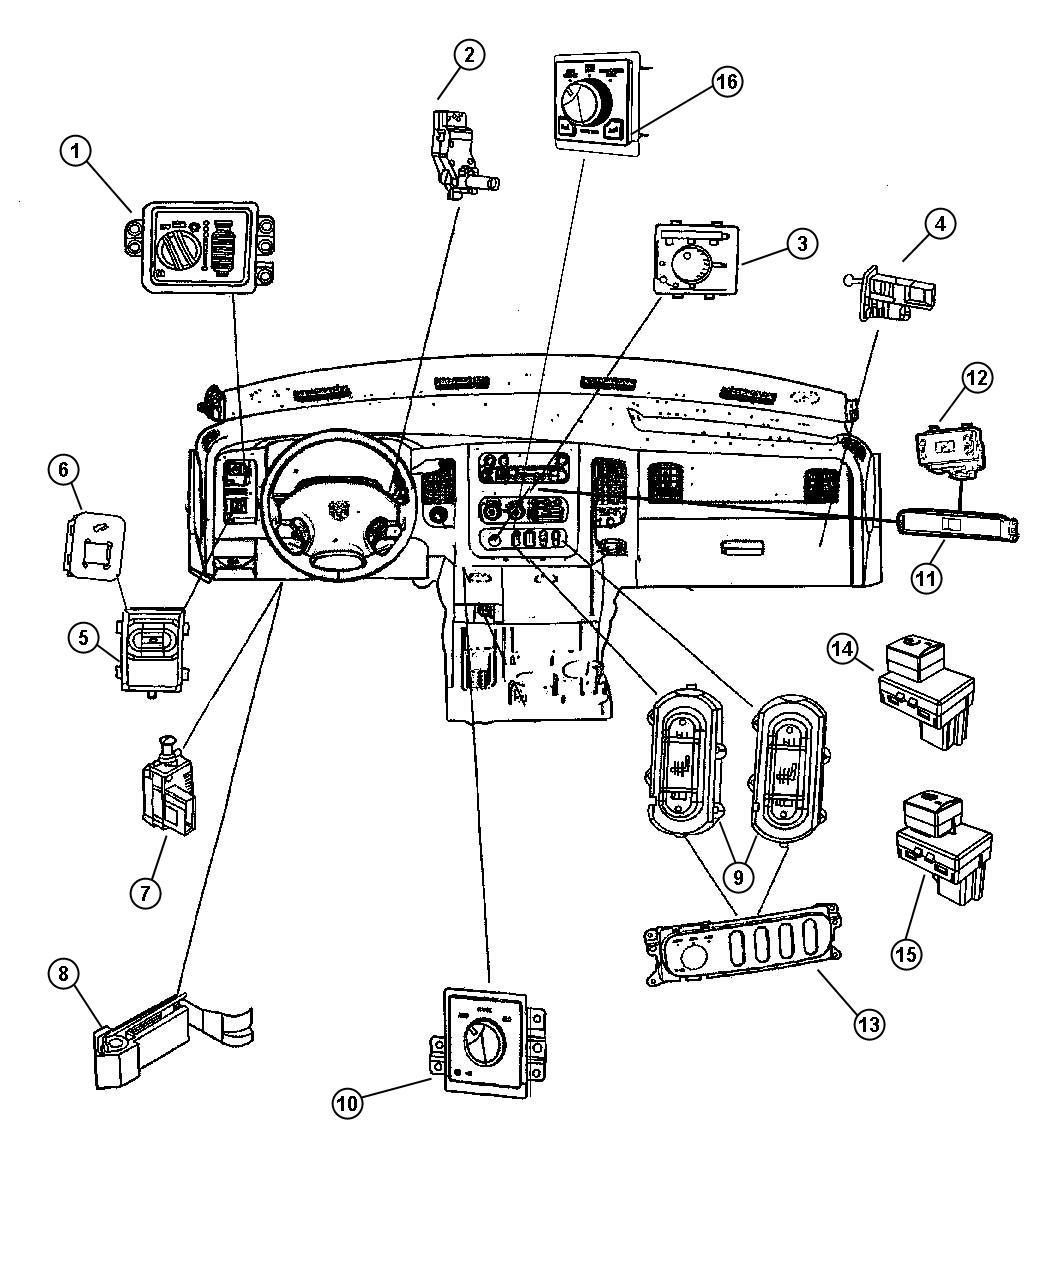 Dodge Ram 2500 Switch  Ignition  Column  Steering  Tilt